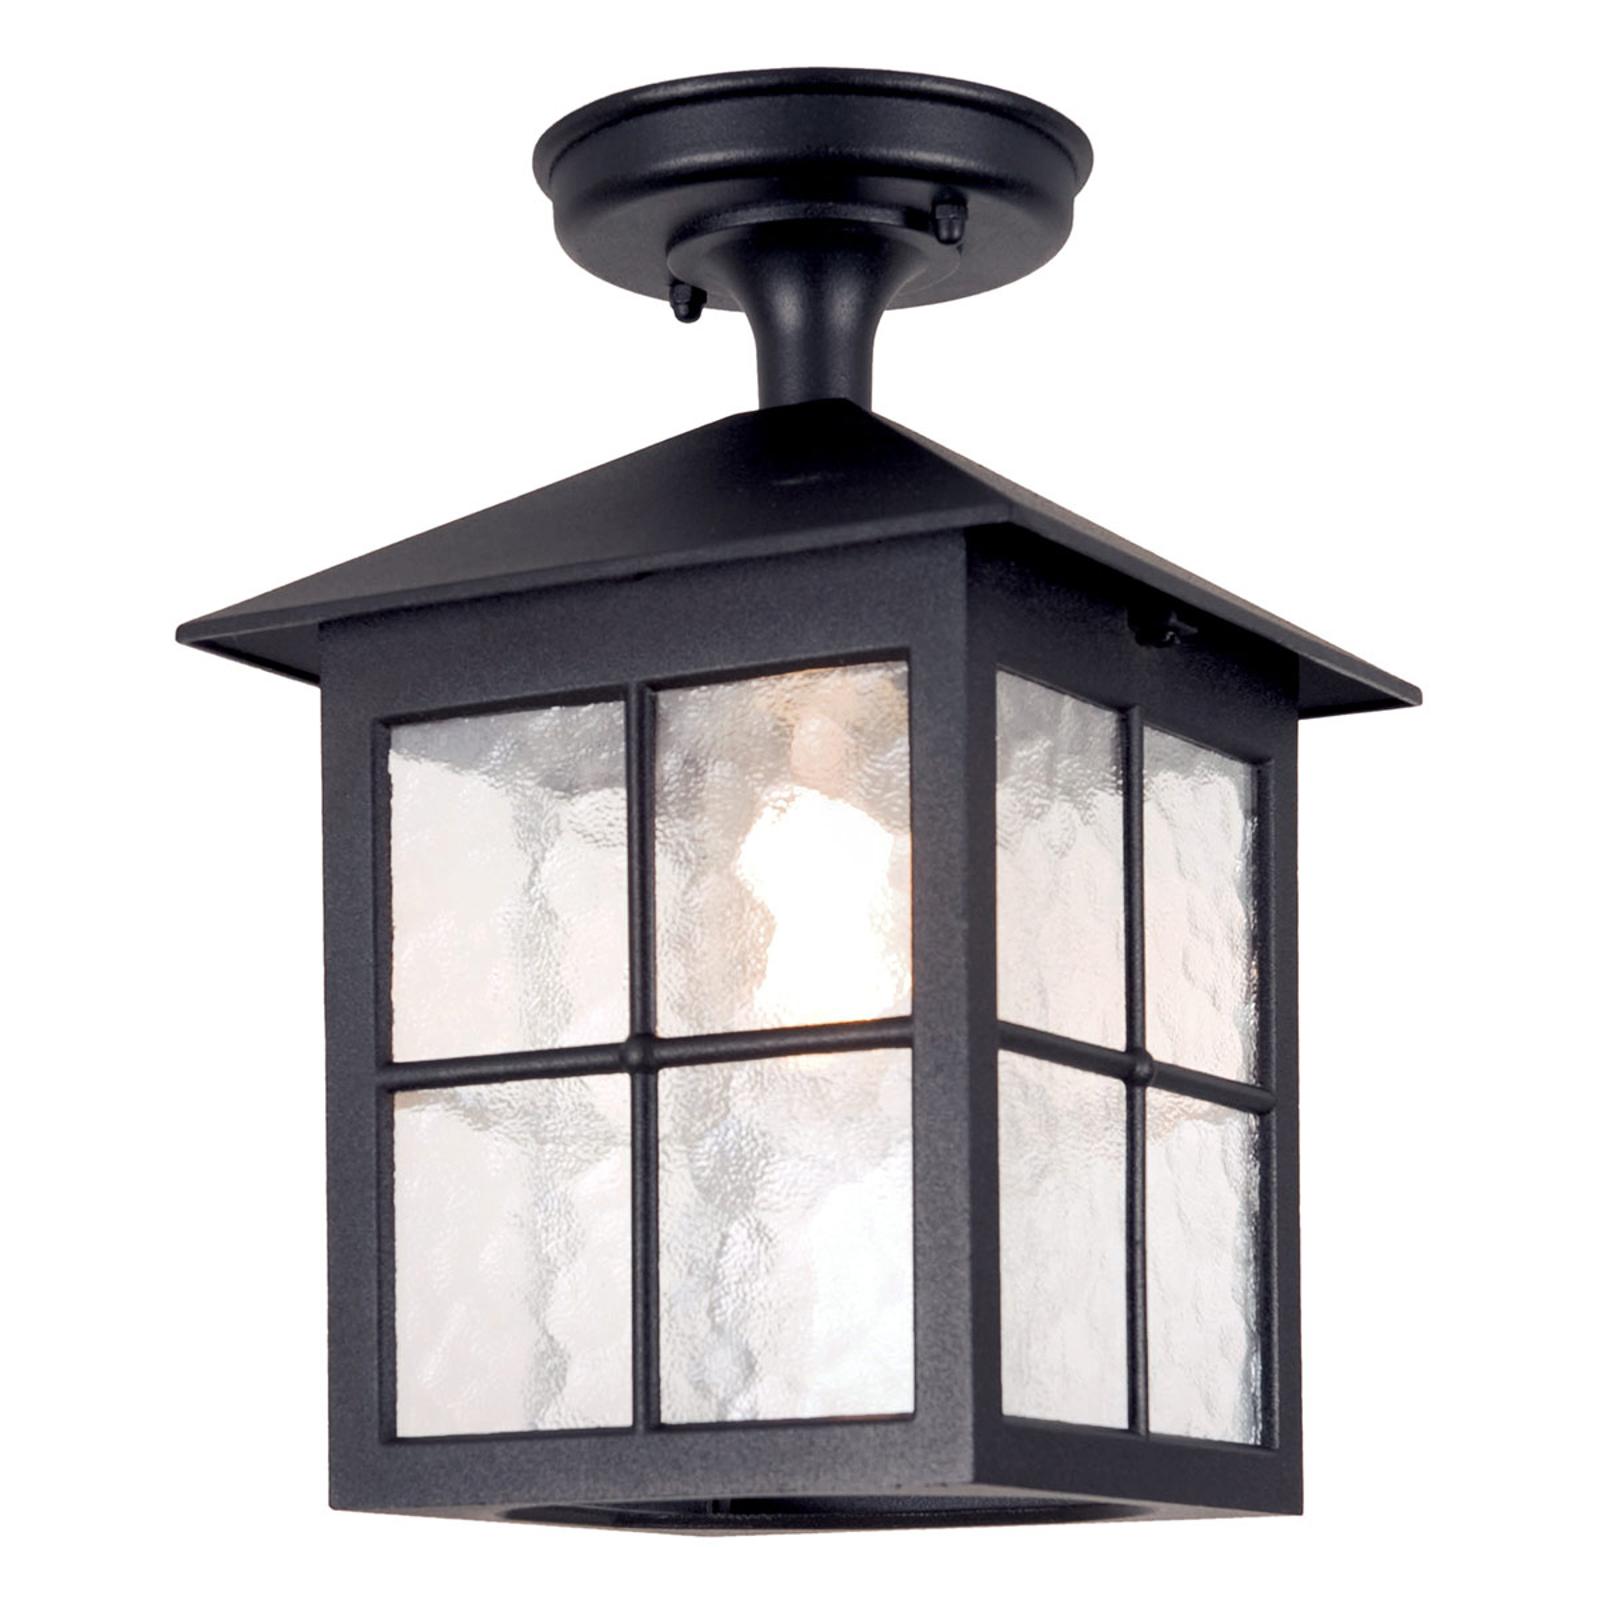 Lampa sufitowa zewnętrzna Winchester BL18A